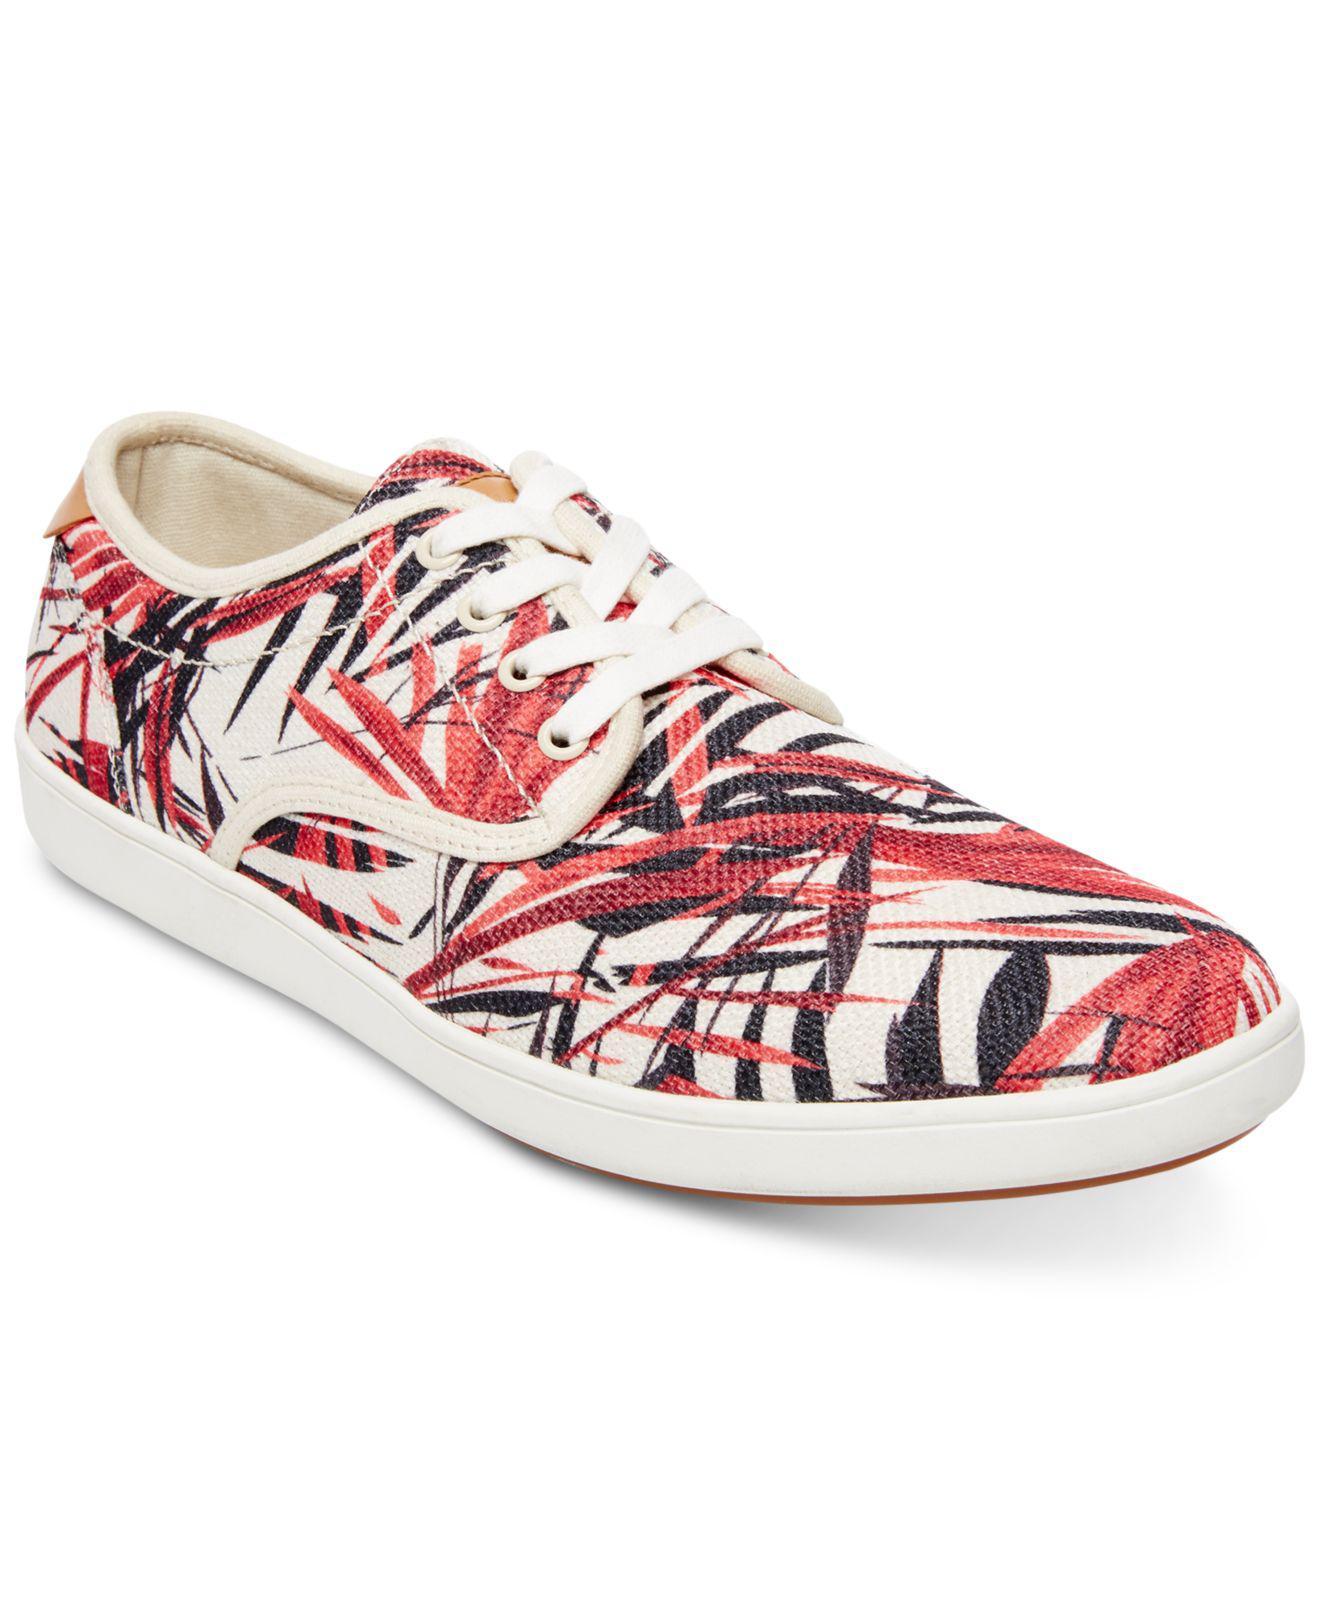 ec3c3ee7927 Lyst - Steve Madden Florider Sneakers in Red